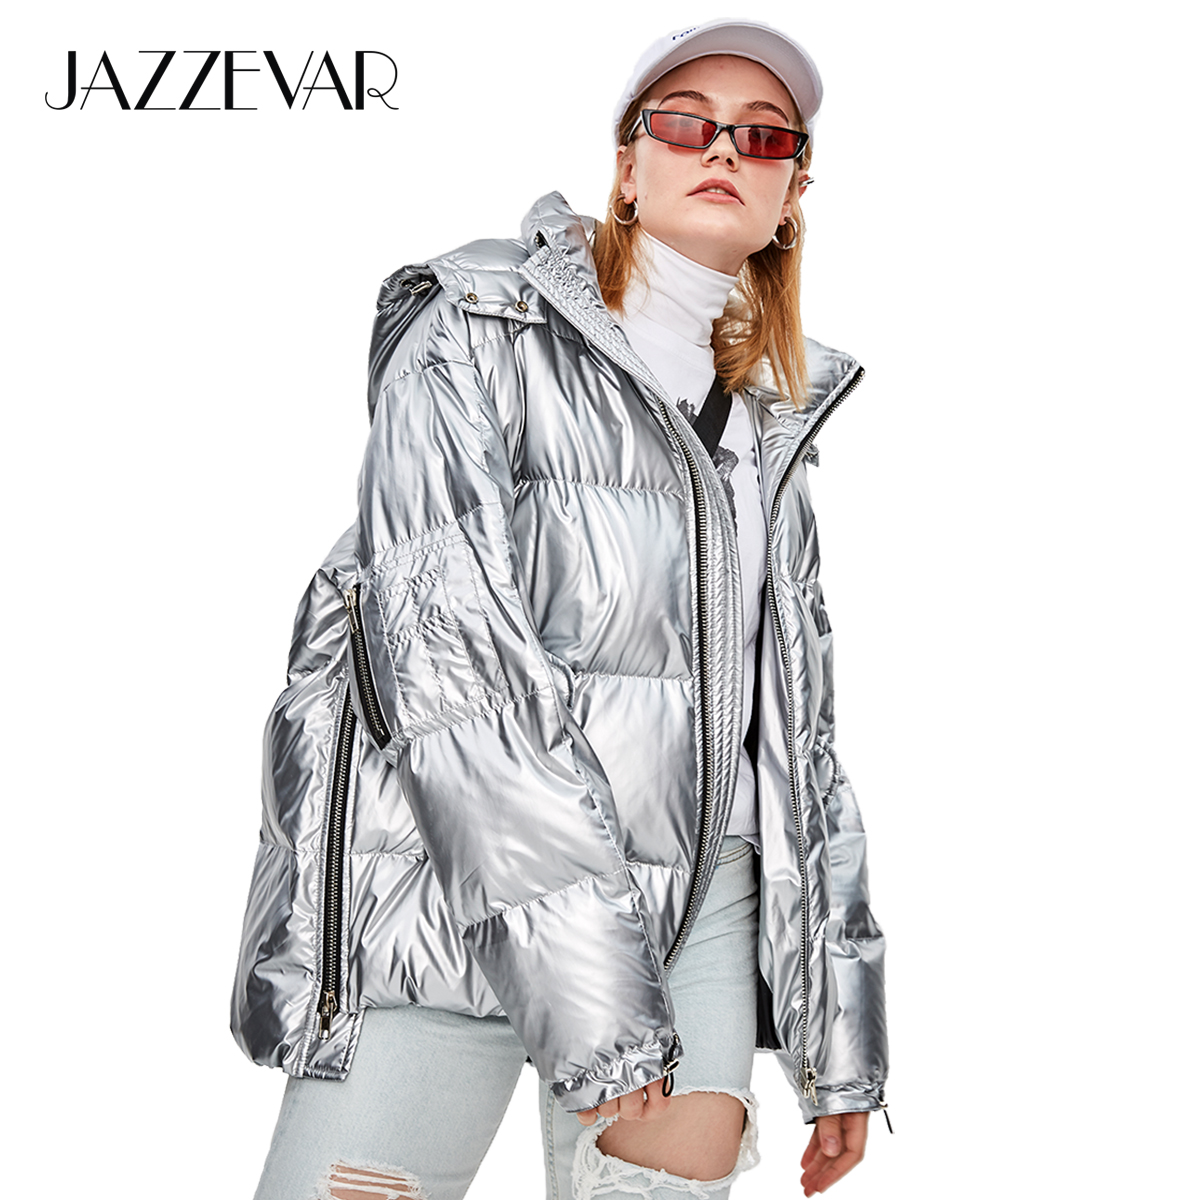 JAZZEVAR 2019 New Winter Fashion Street Womens Edgy Sliver Short   Down   Jacket Cool Girls Zipper Hooded   Down     Coat   Outerwear z18004